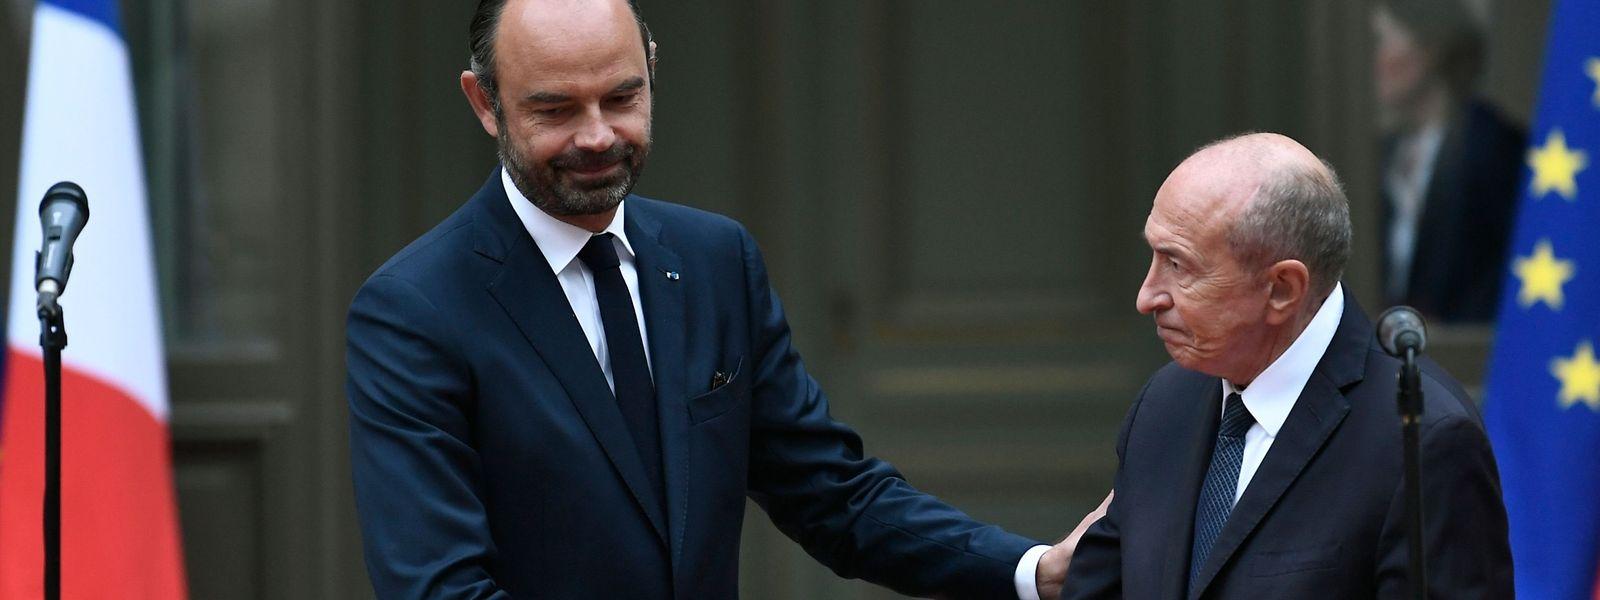 Premierminister Édouard Philippe (links) wird Gérard Collomb vorerst vertreten.